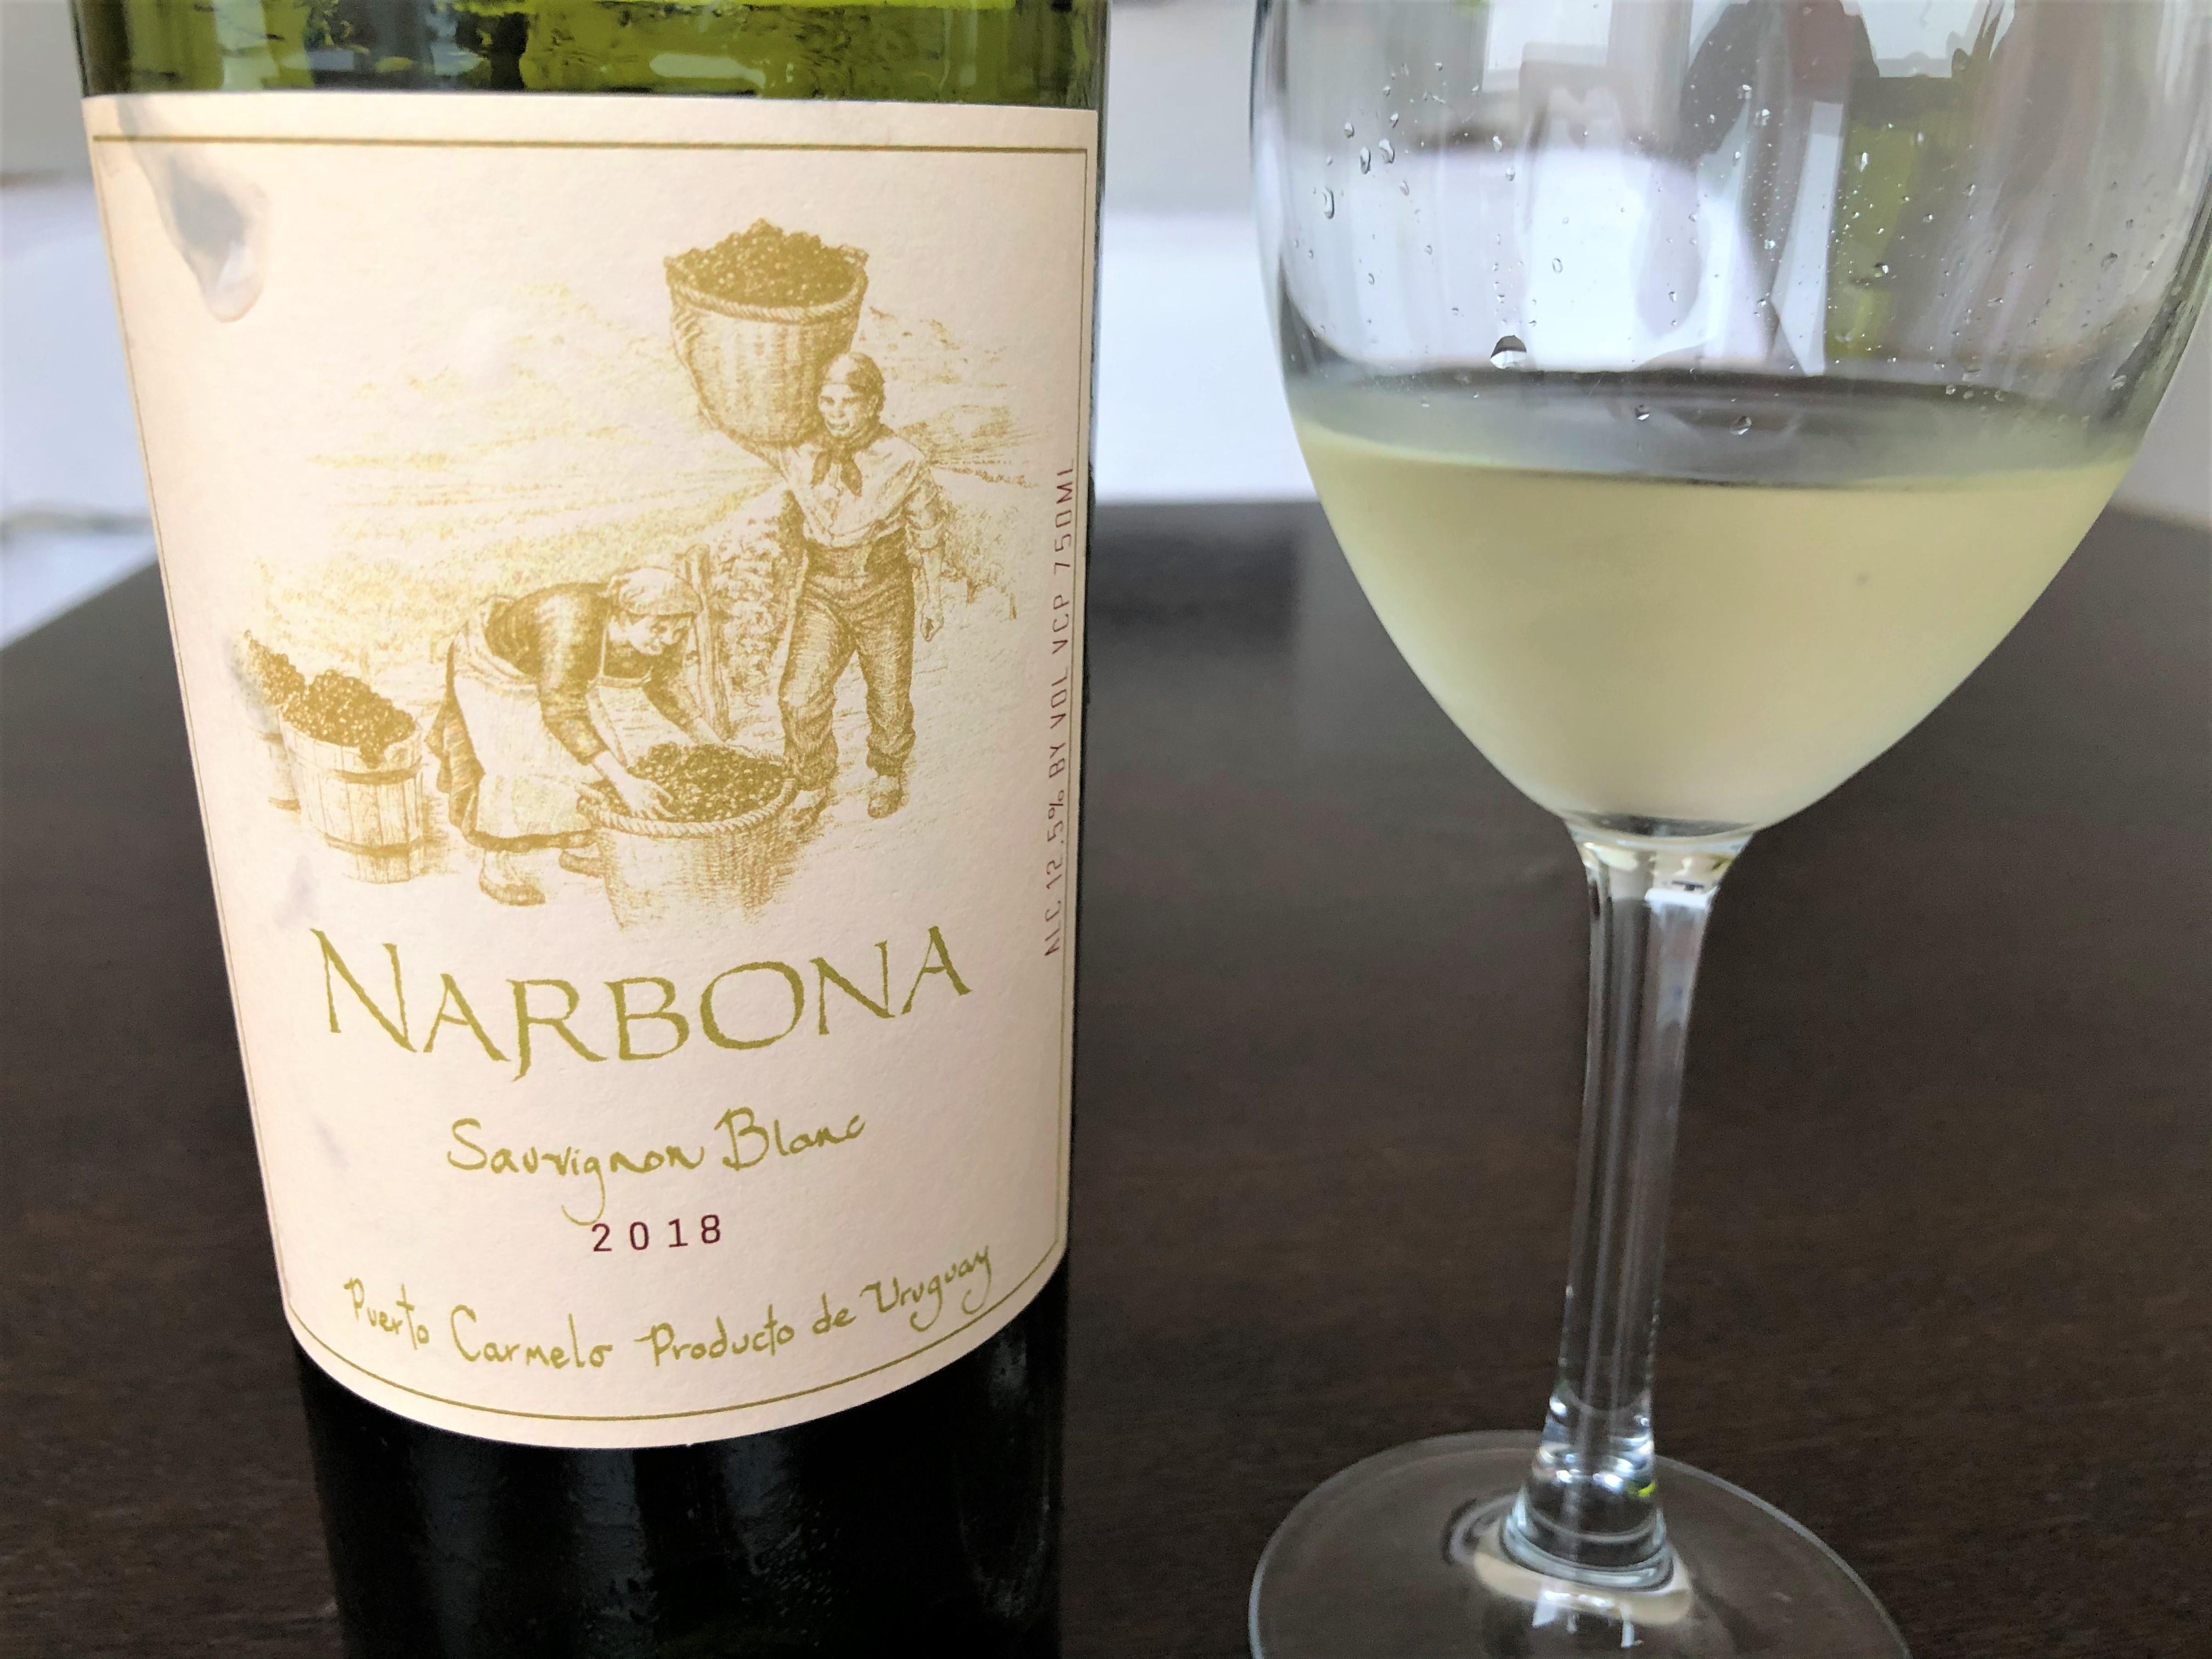 Narbona Sauvignon Blanc